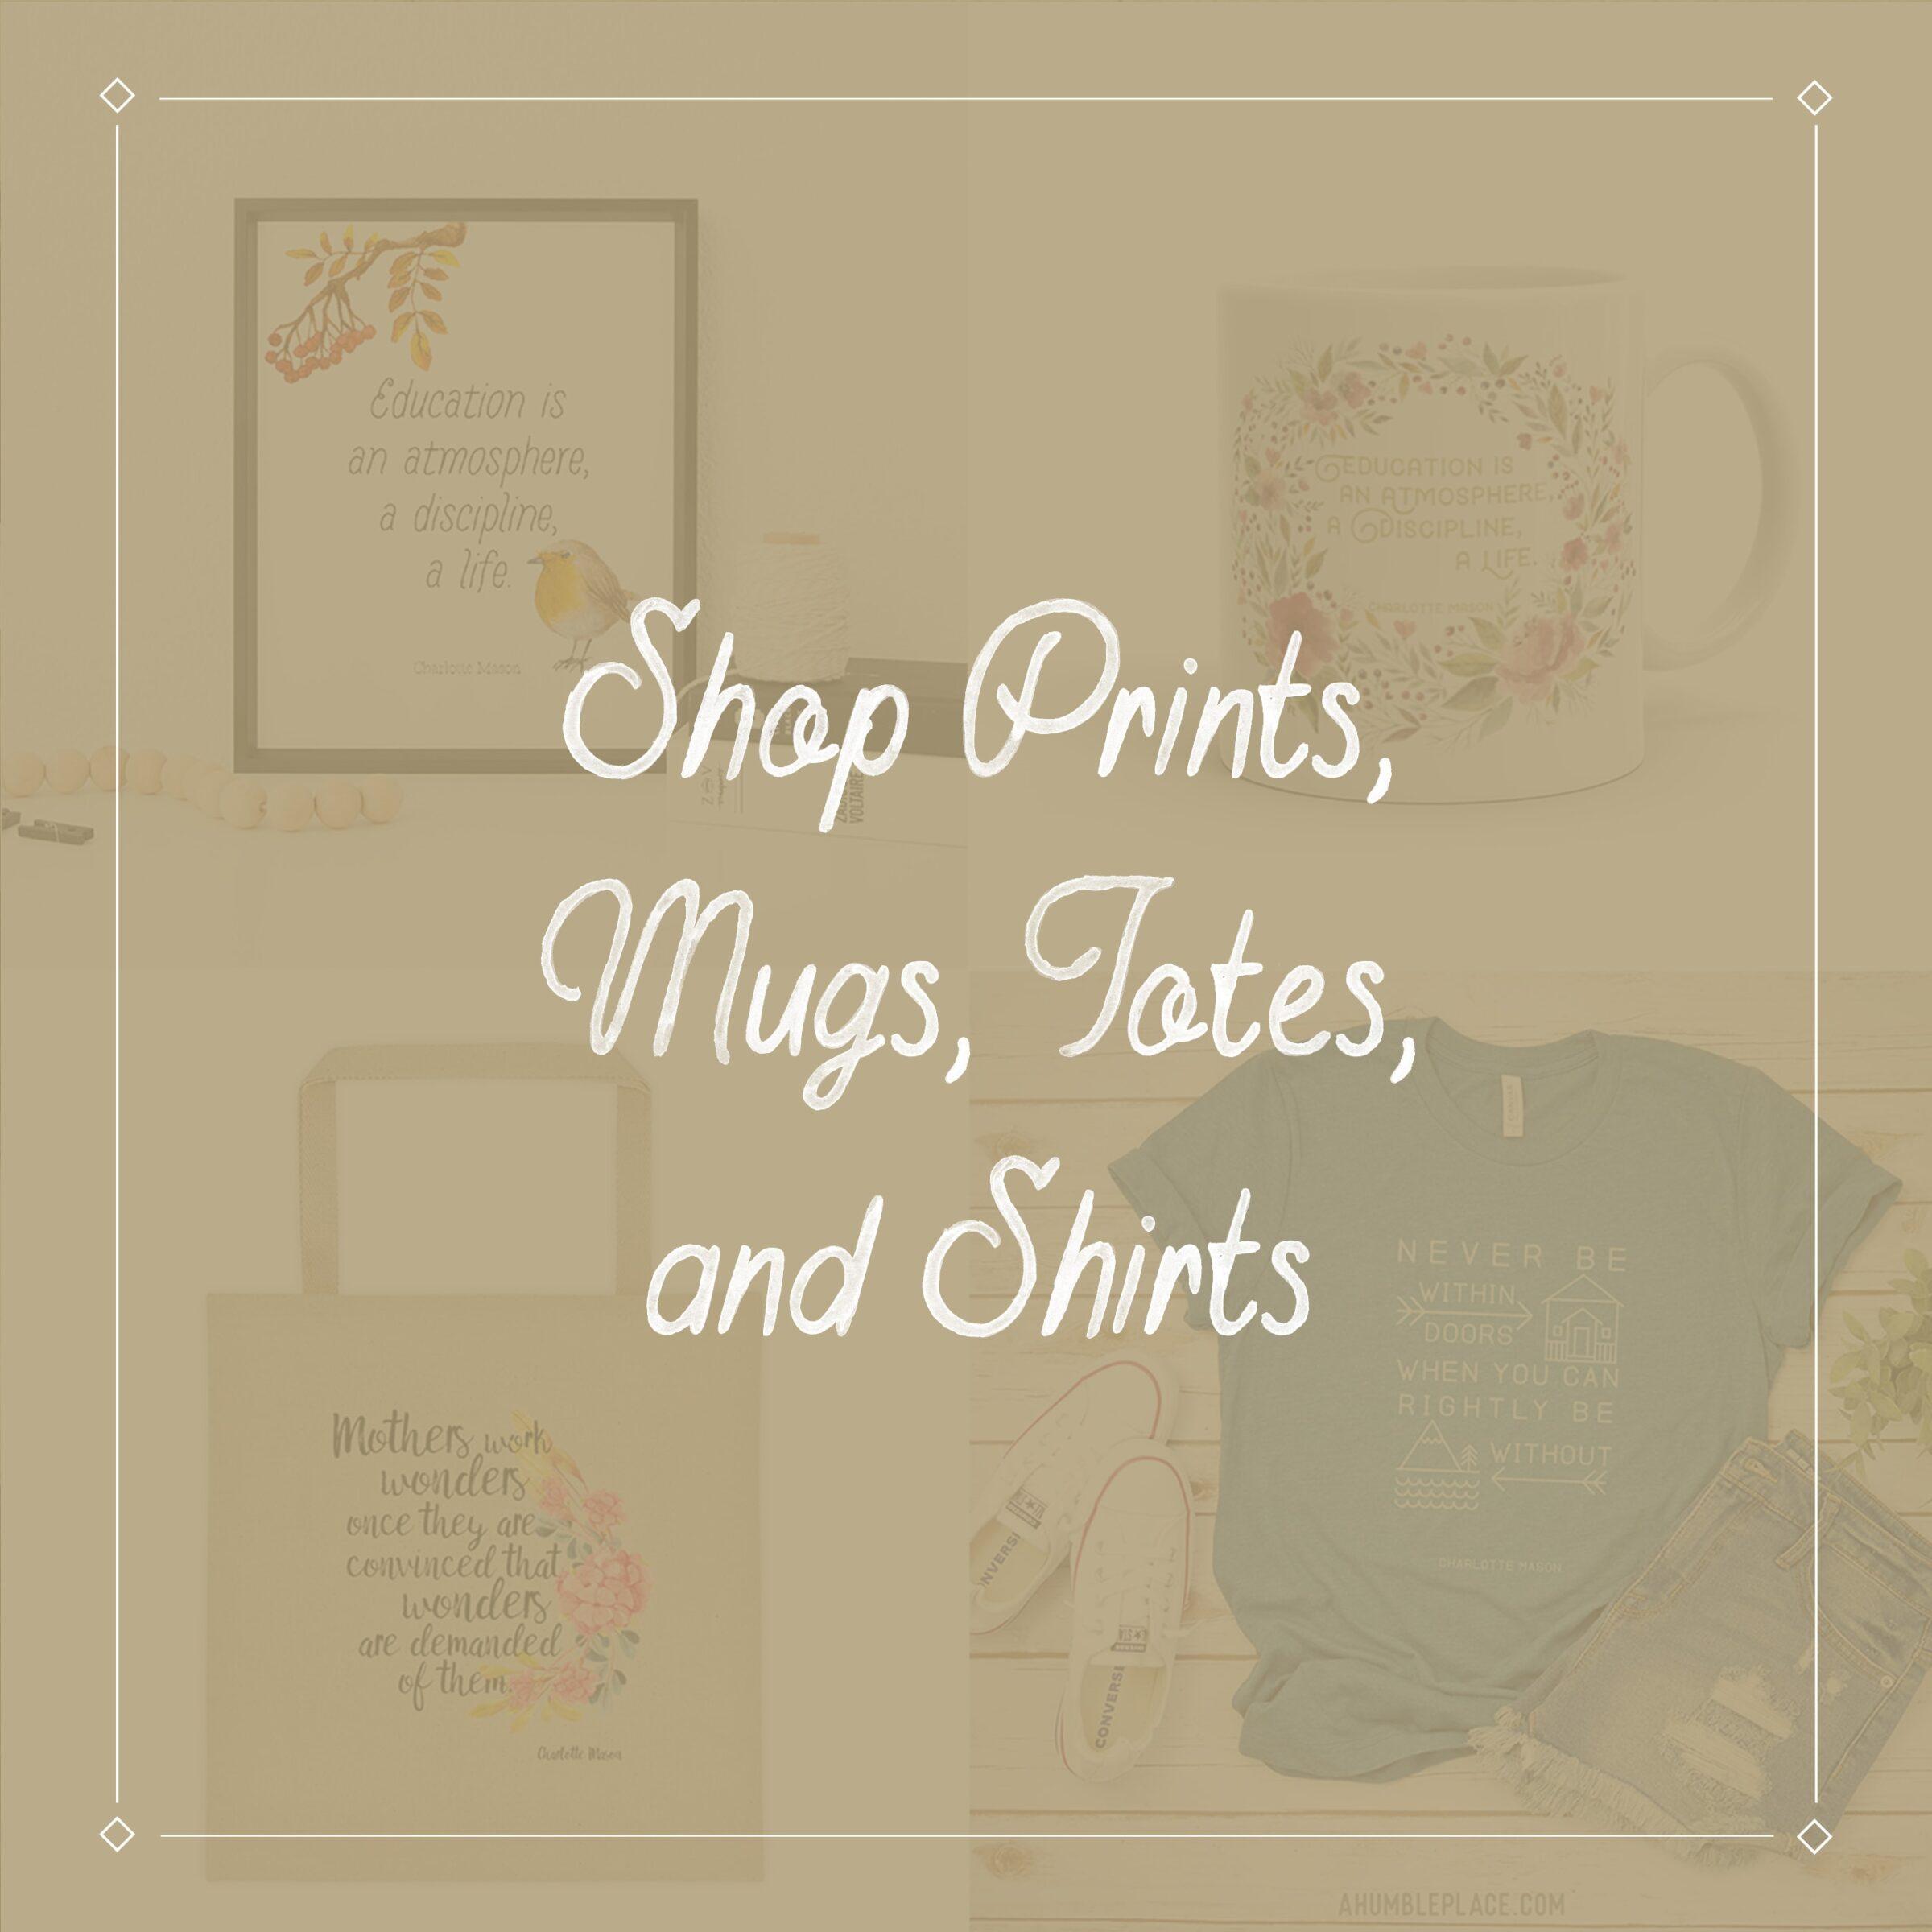 Shop - ahumbleplace.com